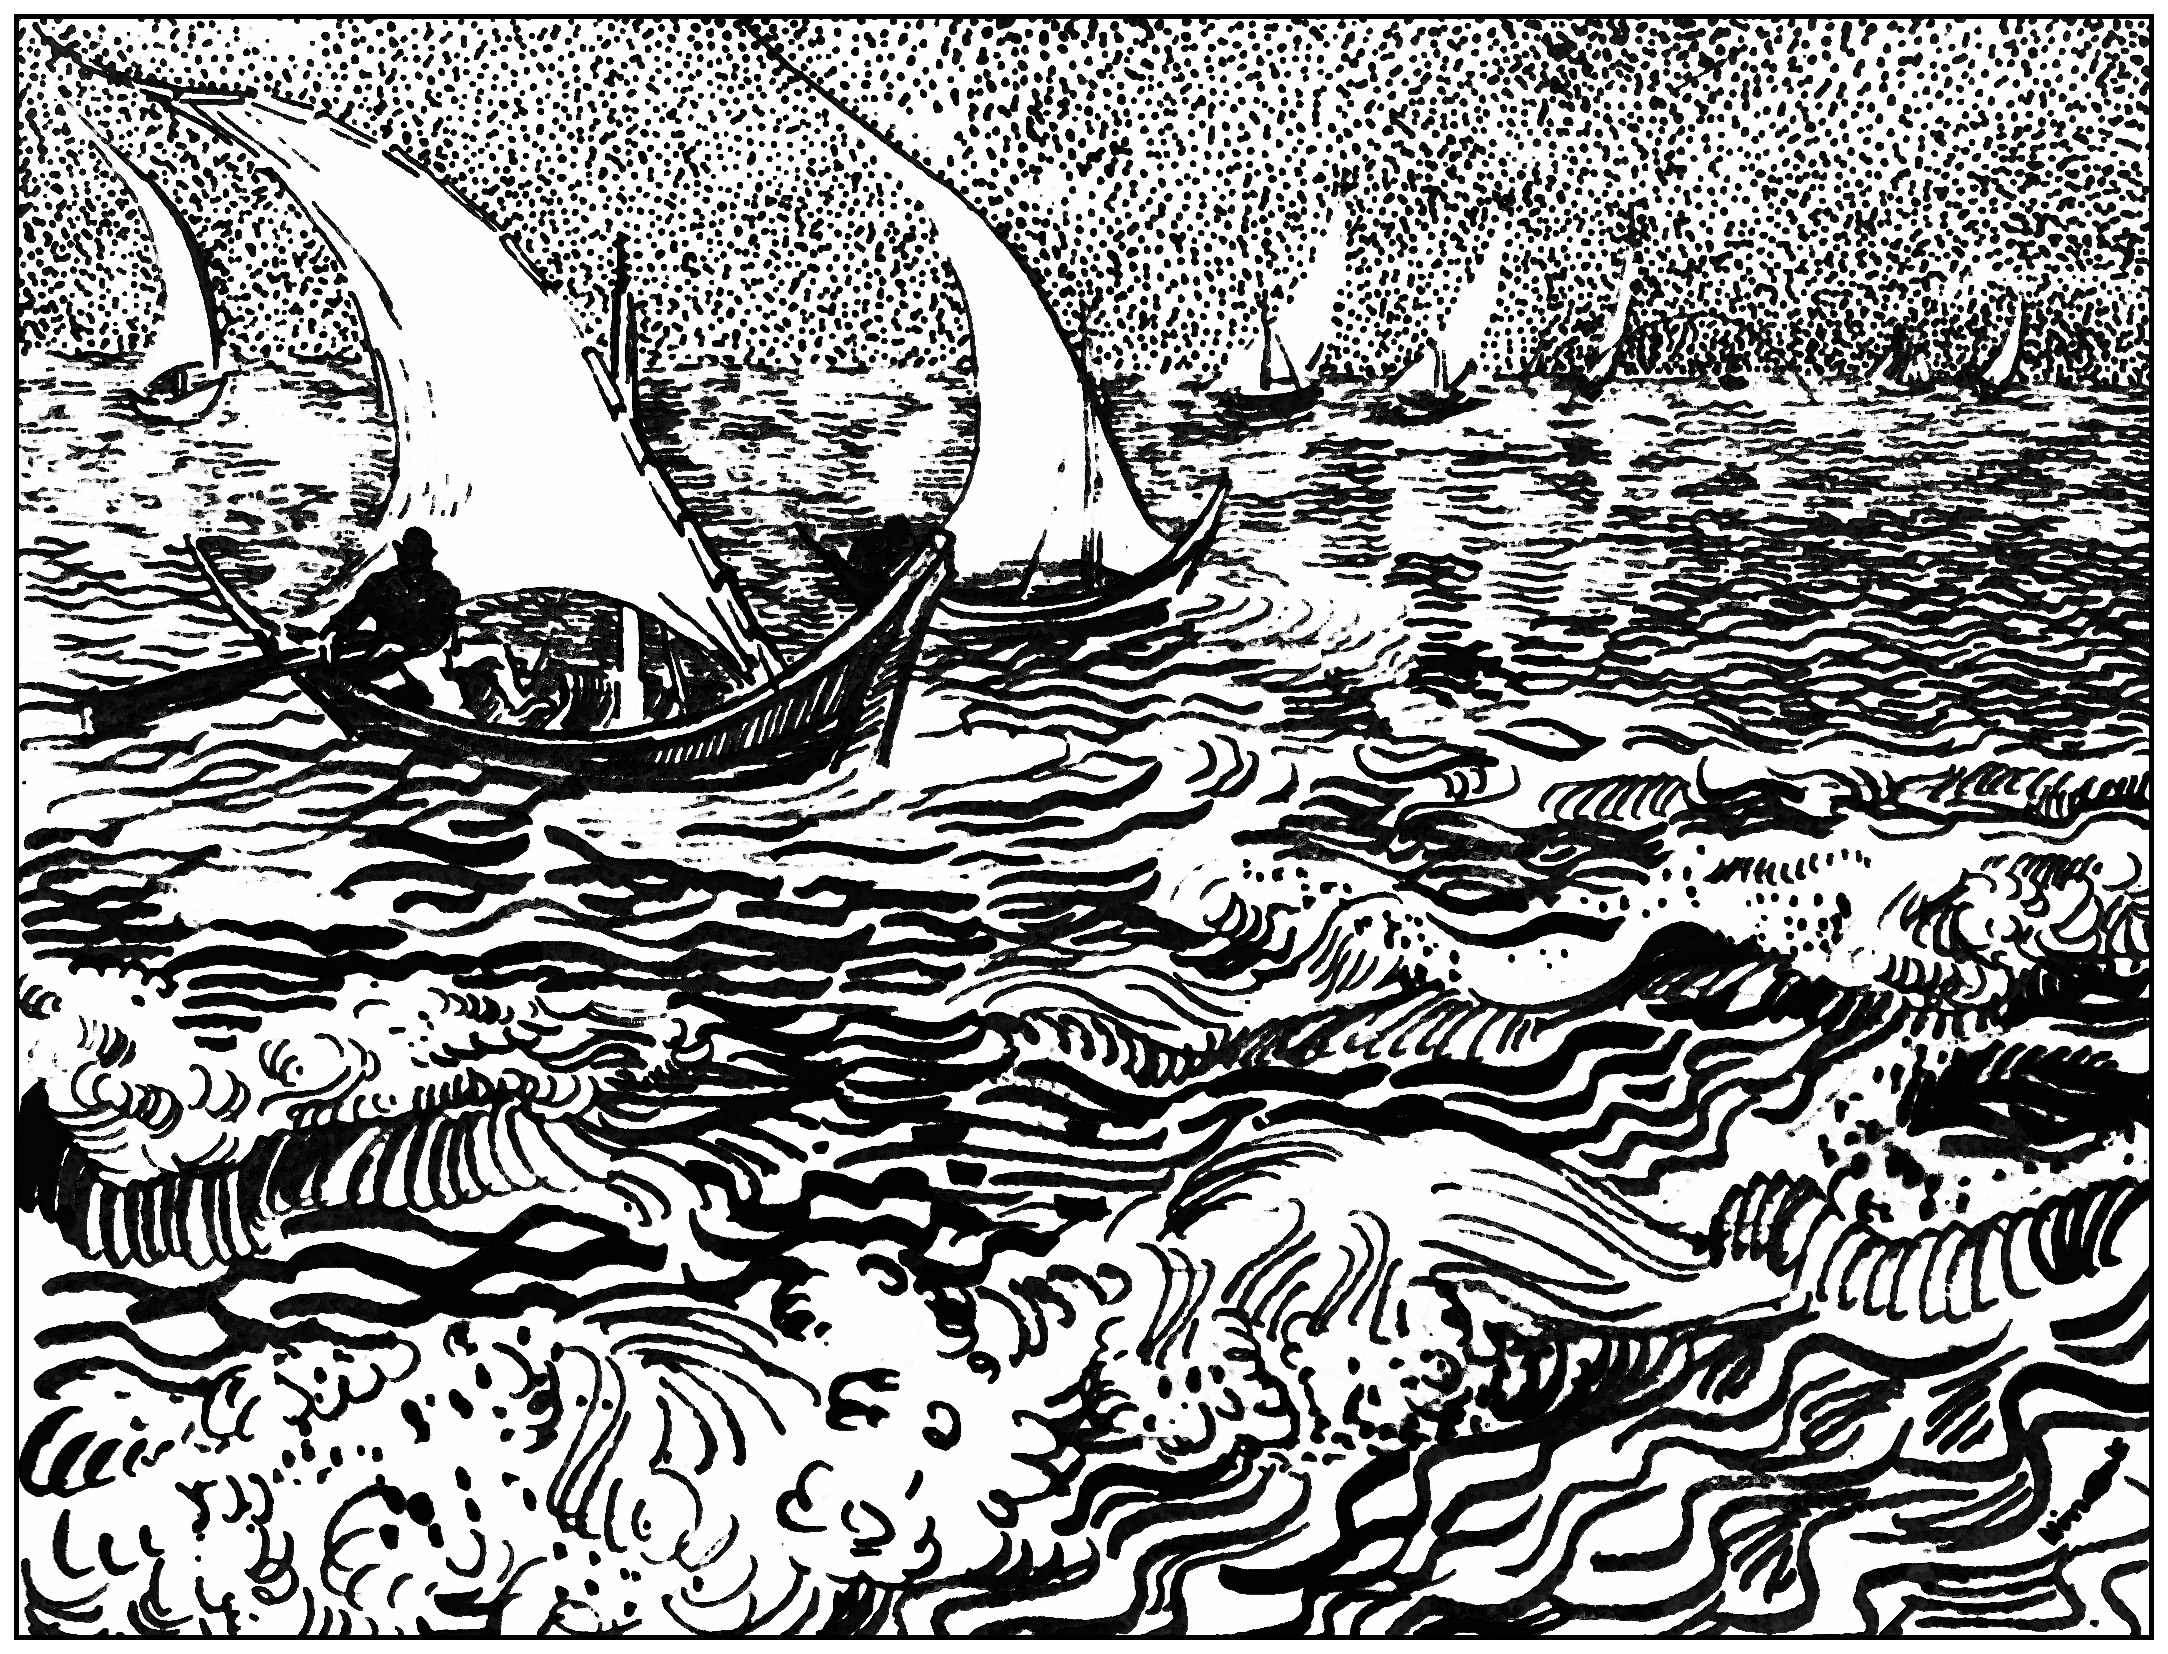 Van gogh marine aux saintes marie de la mer 1888 chefs d - Coloriage van gogh ...